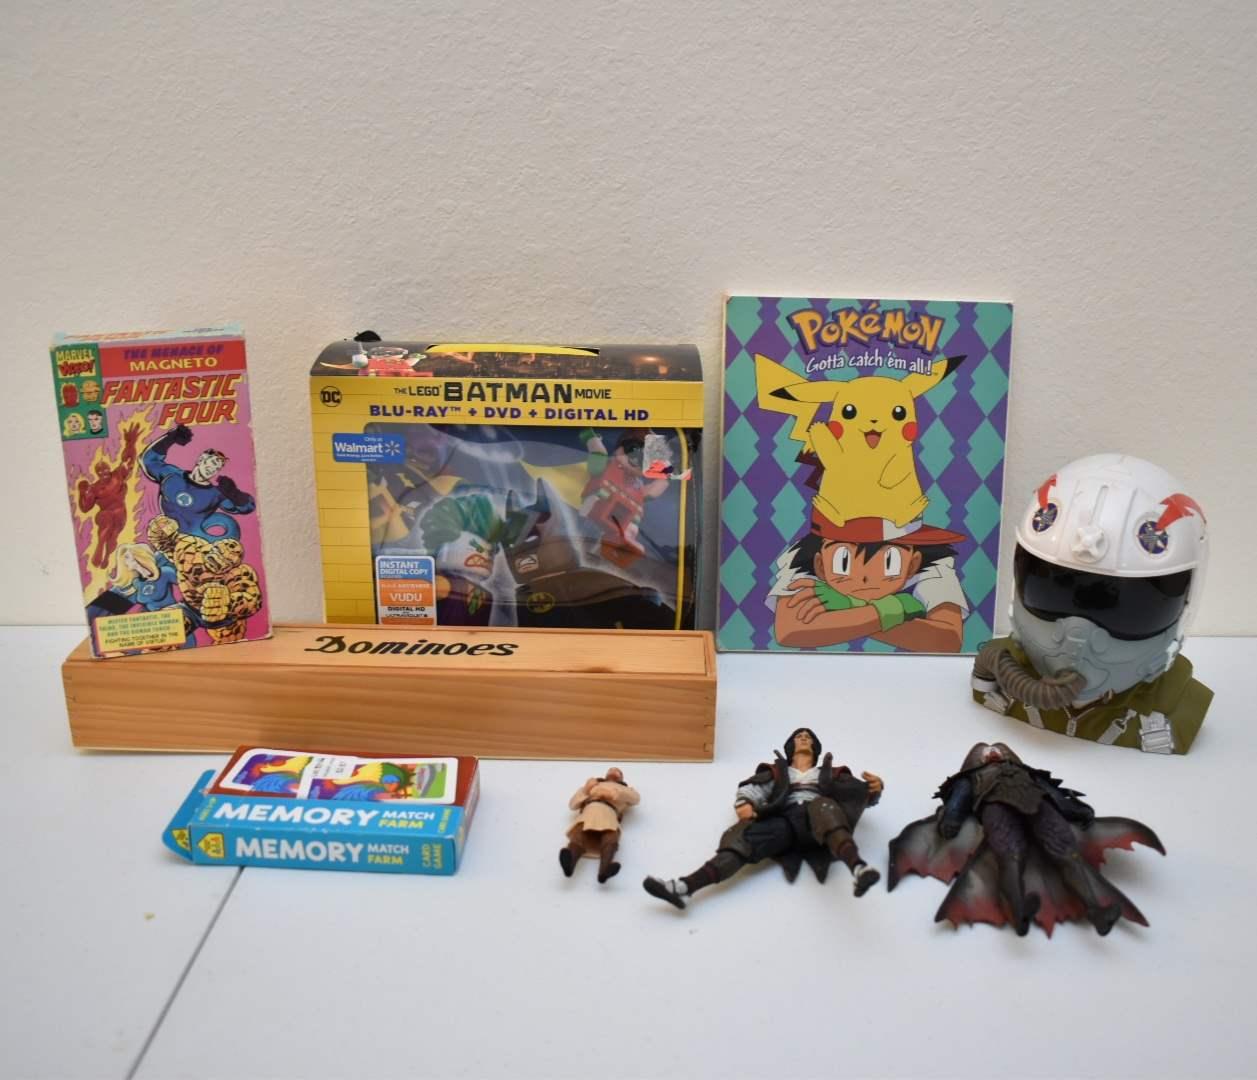 *NEW* Lego Batman Lunchbox with DVD, Dominoes, Pokemon Art, Figures, Vintage Fantastic Four VHS